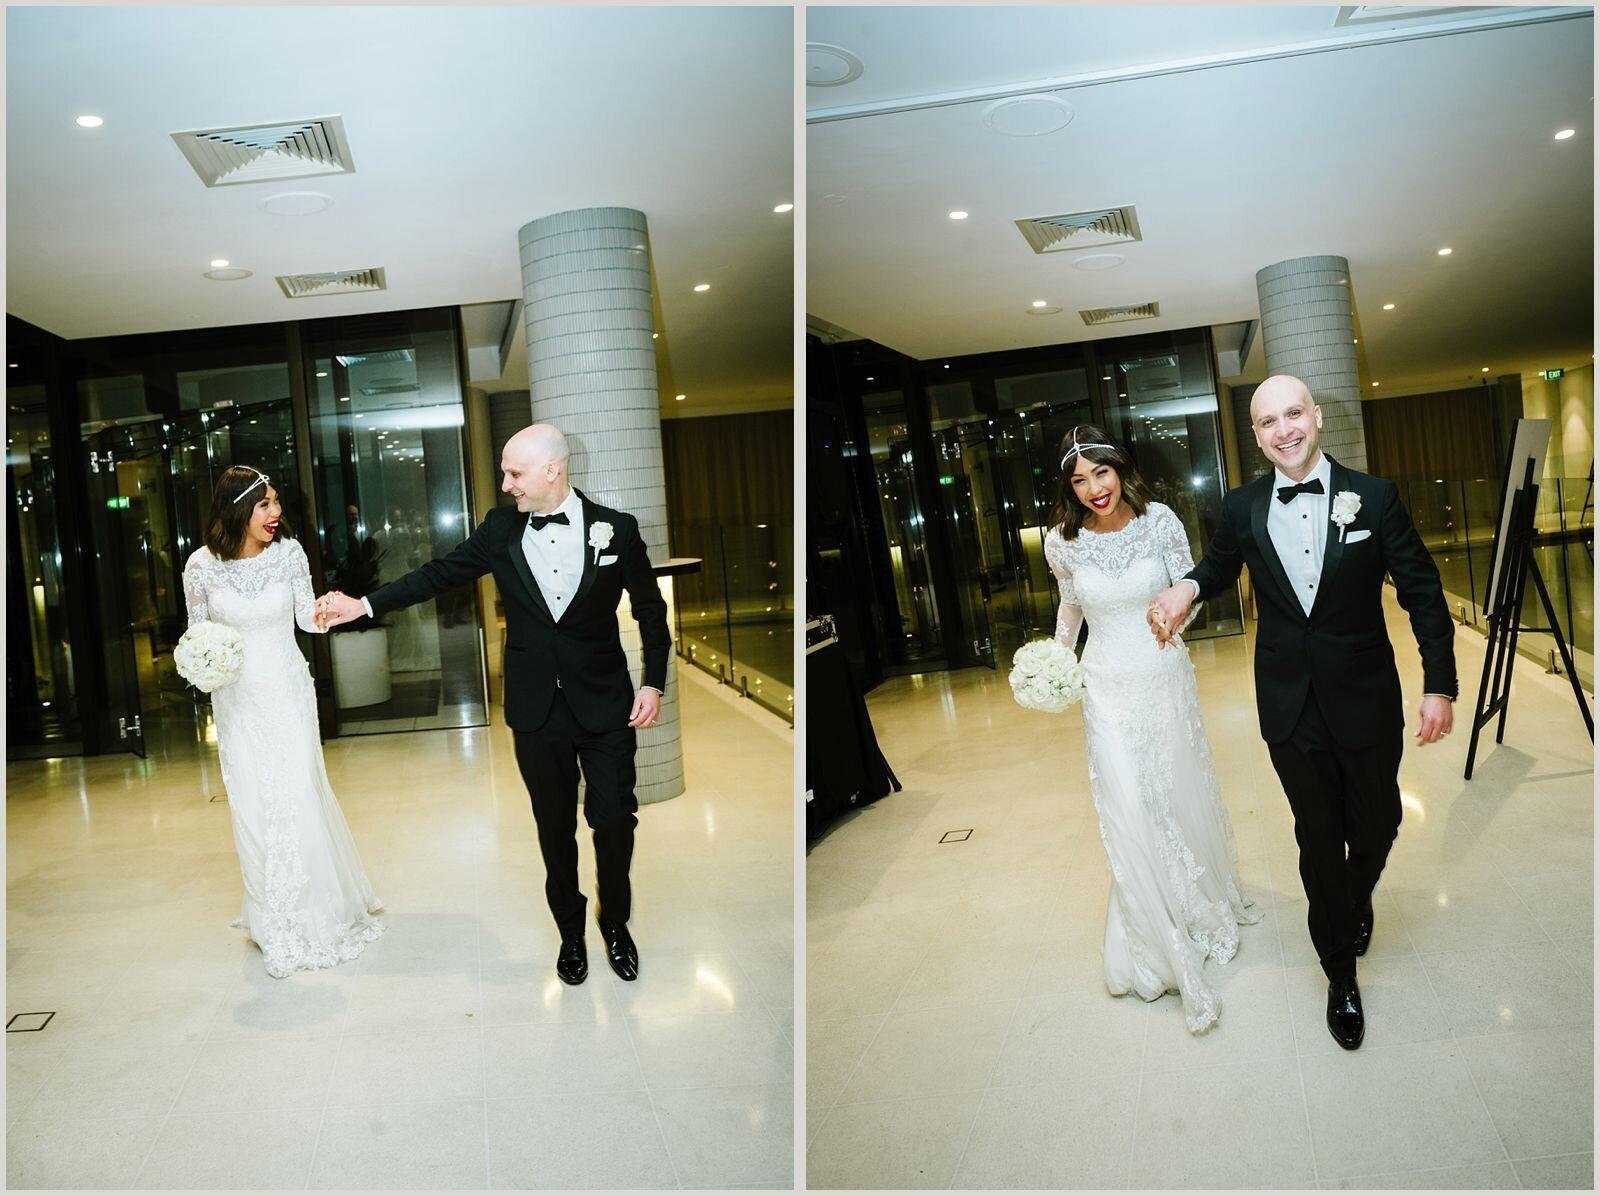 joseph_koprek_wedding_melbourne_the_prince_deck_0076.jpg